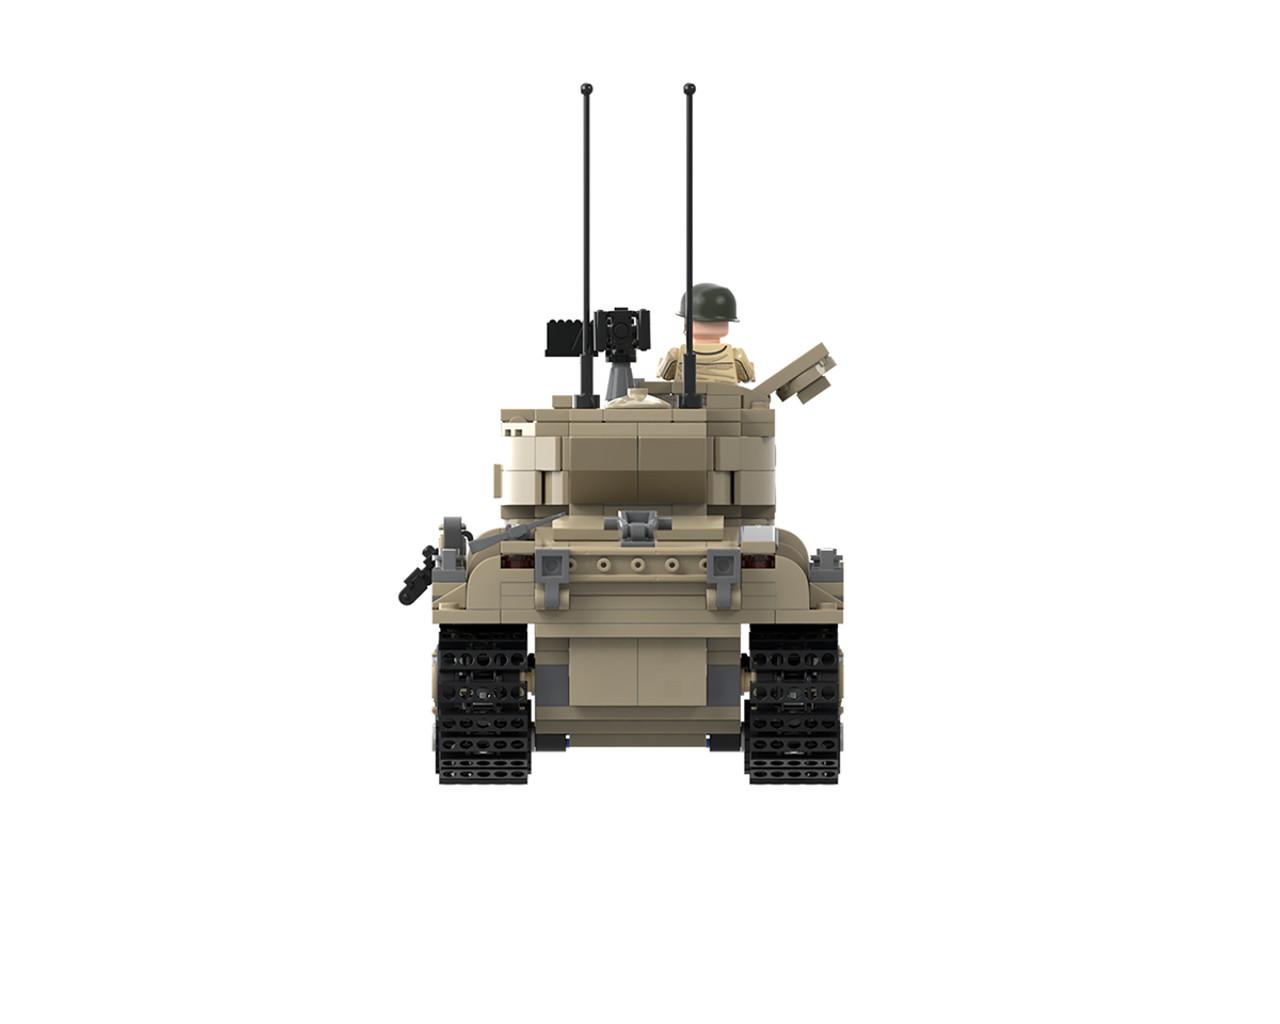 M51 Super Sherman - Main Battle Tank